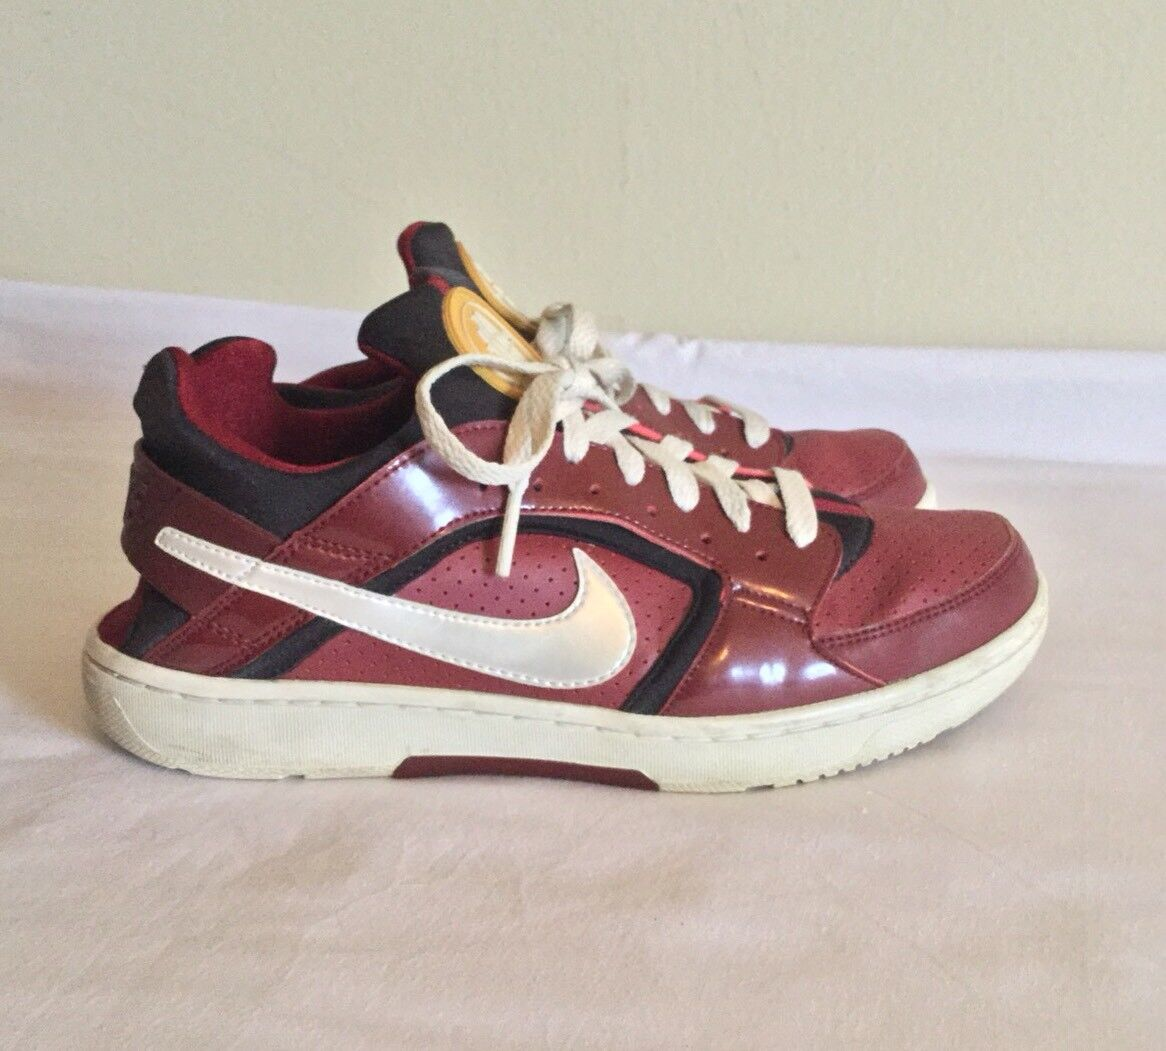 NIKE  Authentic Huarache Crimson And Black Athletic Tennis shoes Size 8.5